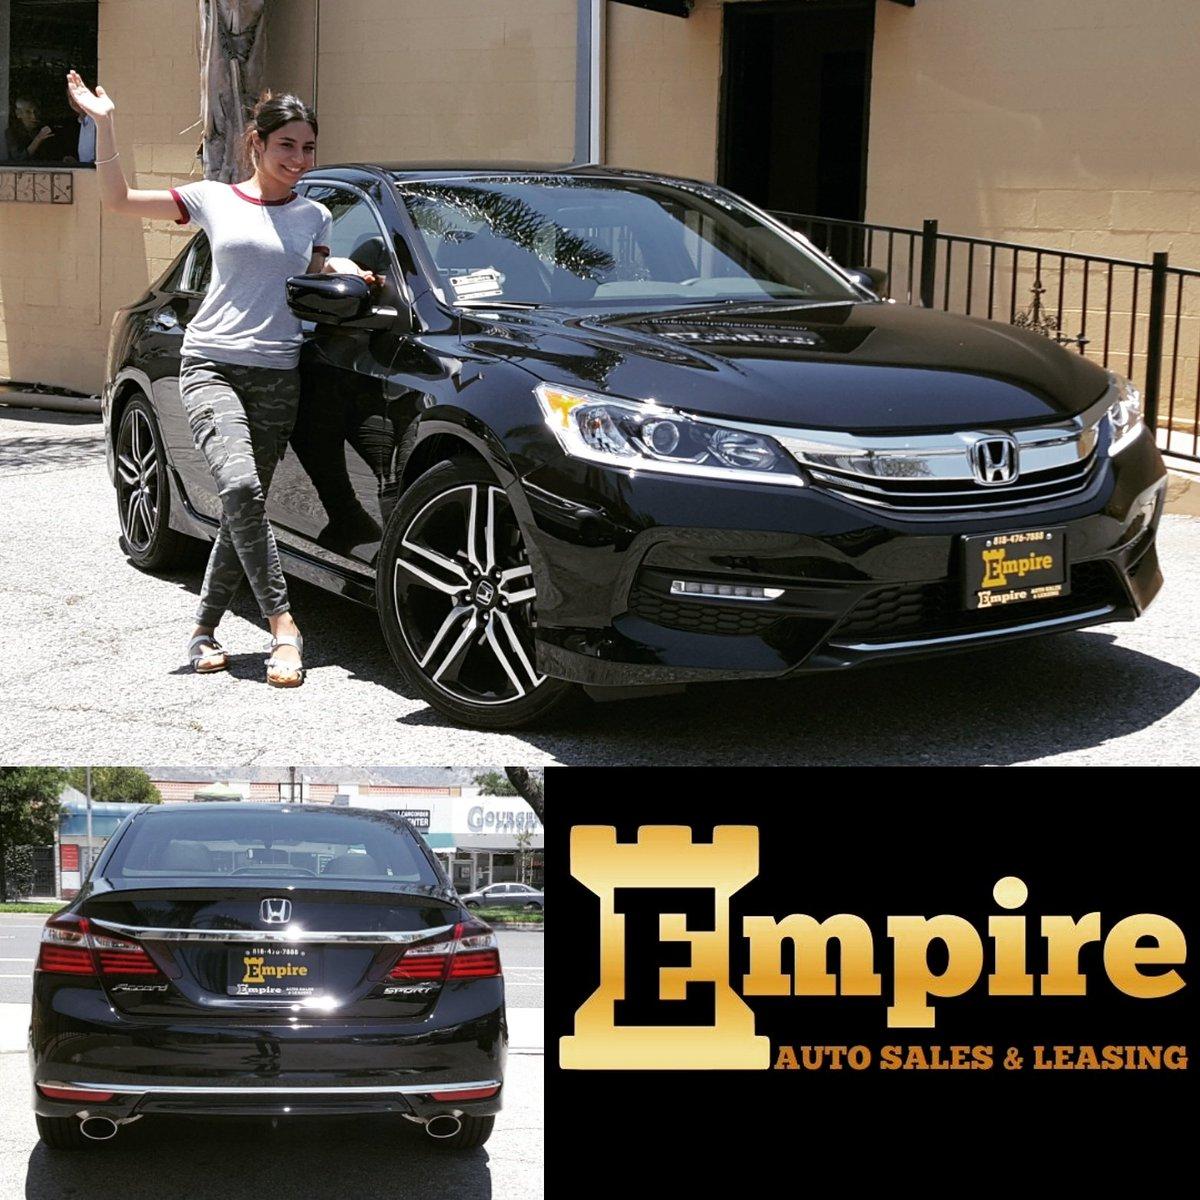 Empire Auto Sales >> Empire Auto Sales On Twitter Congratulations Klansi On